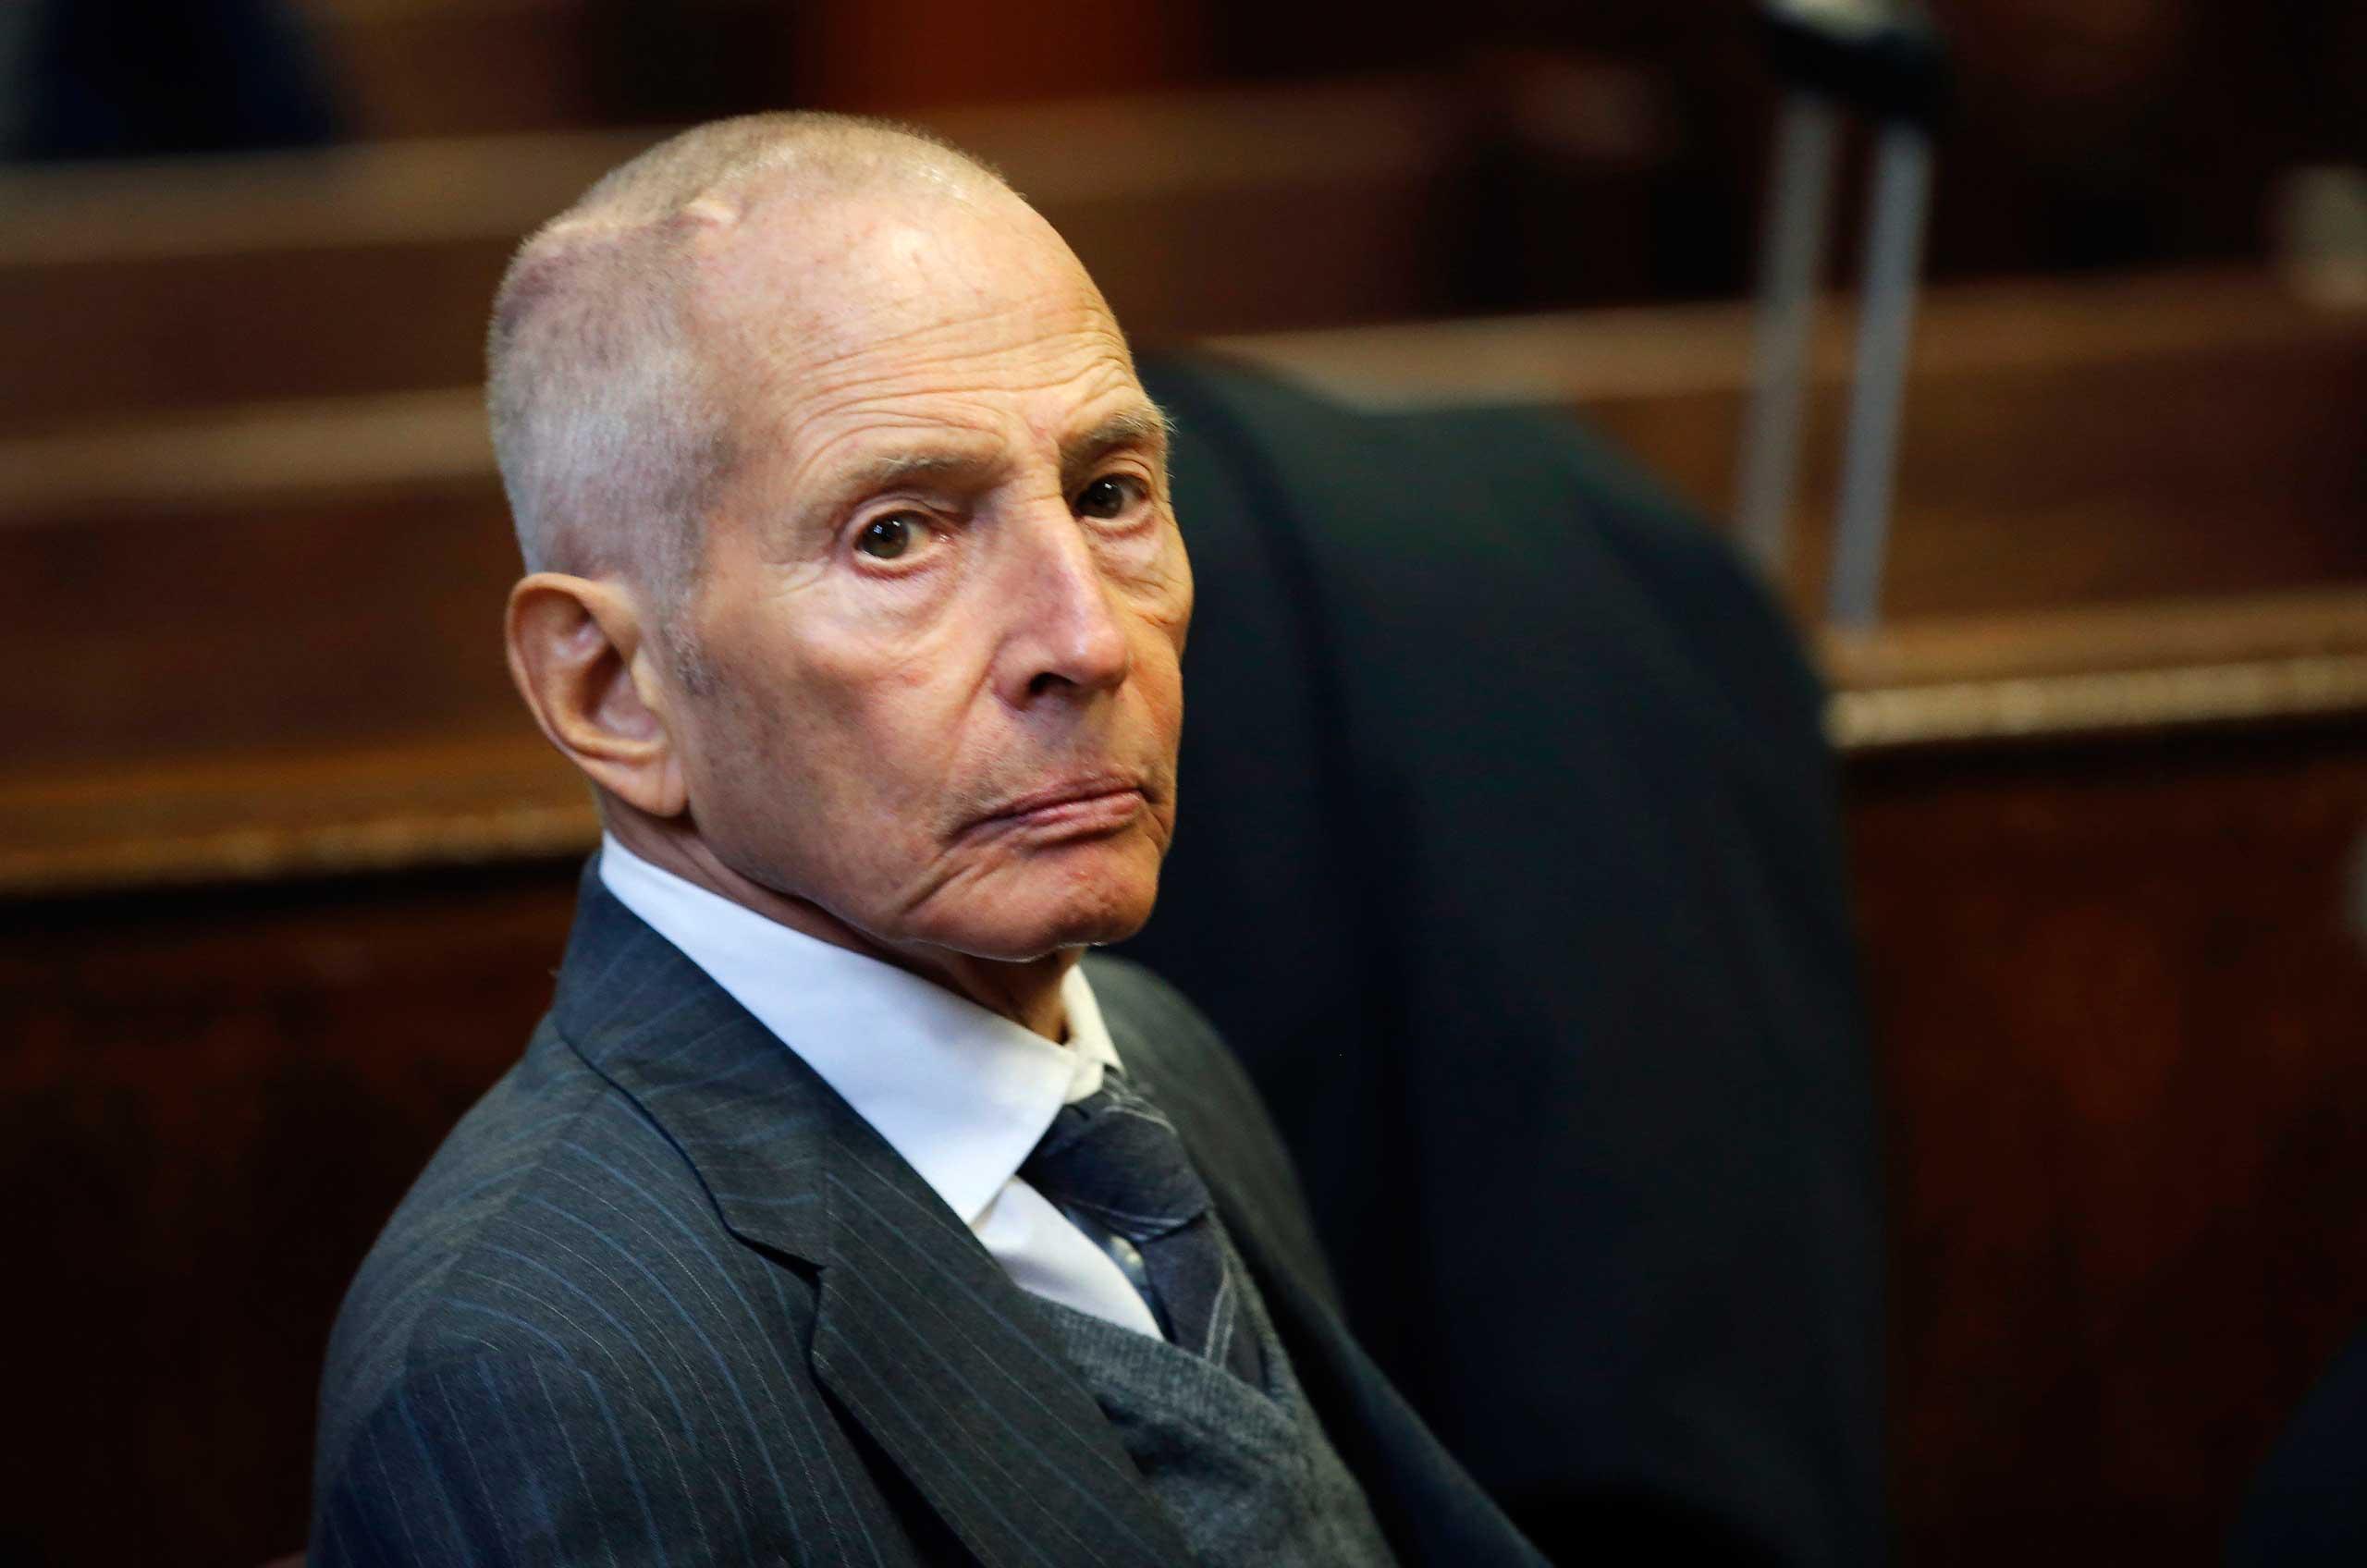 Robert Durst appears in court in New York, Dec. 2014